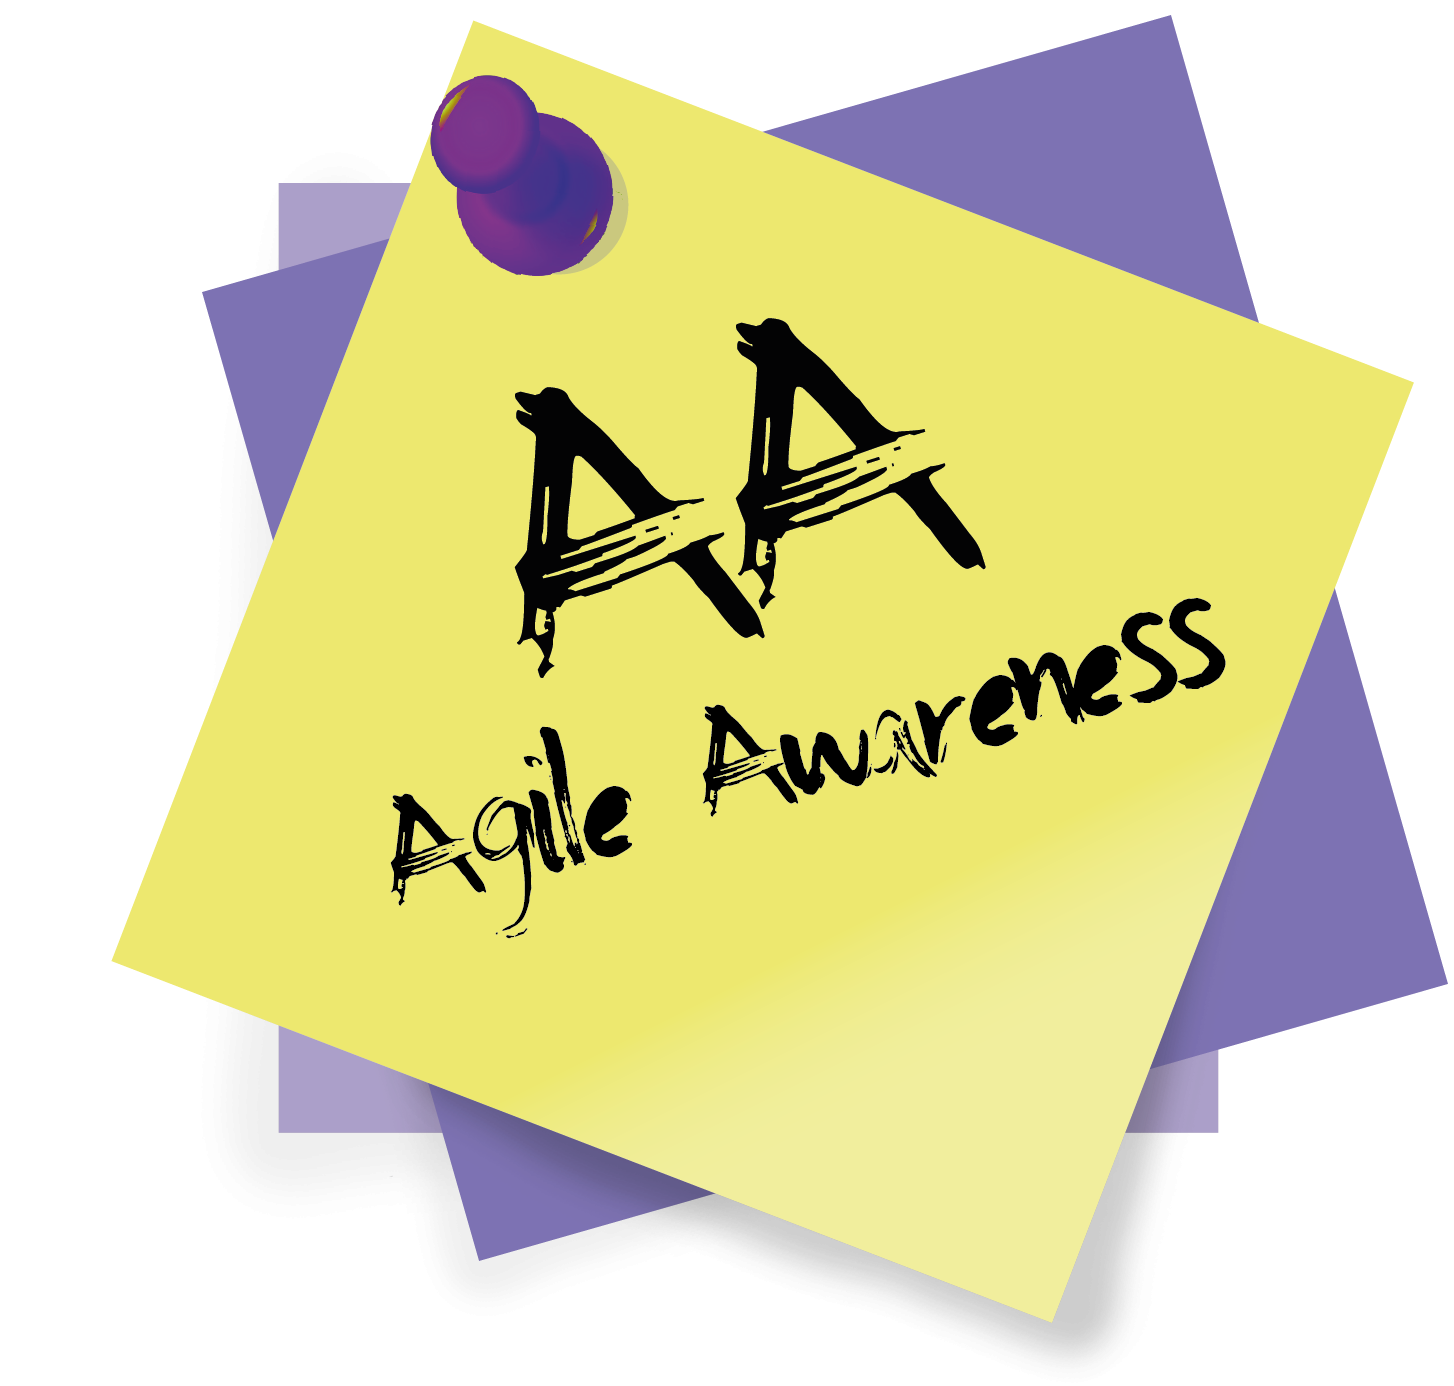 Agile Awareness